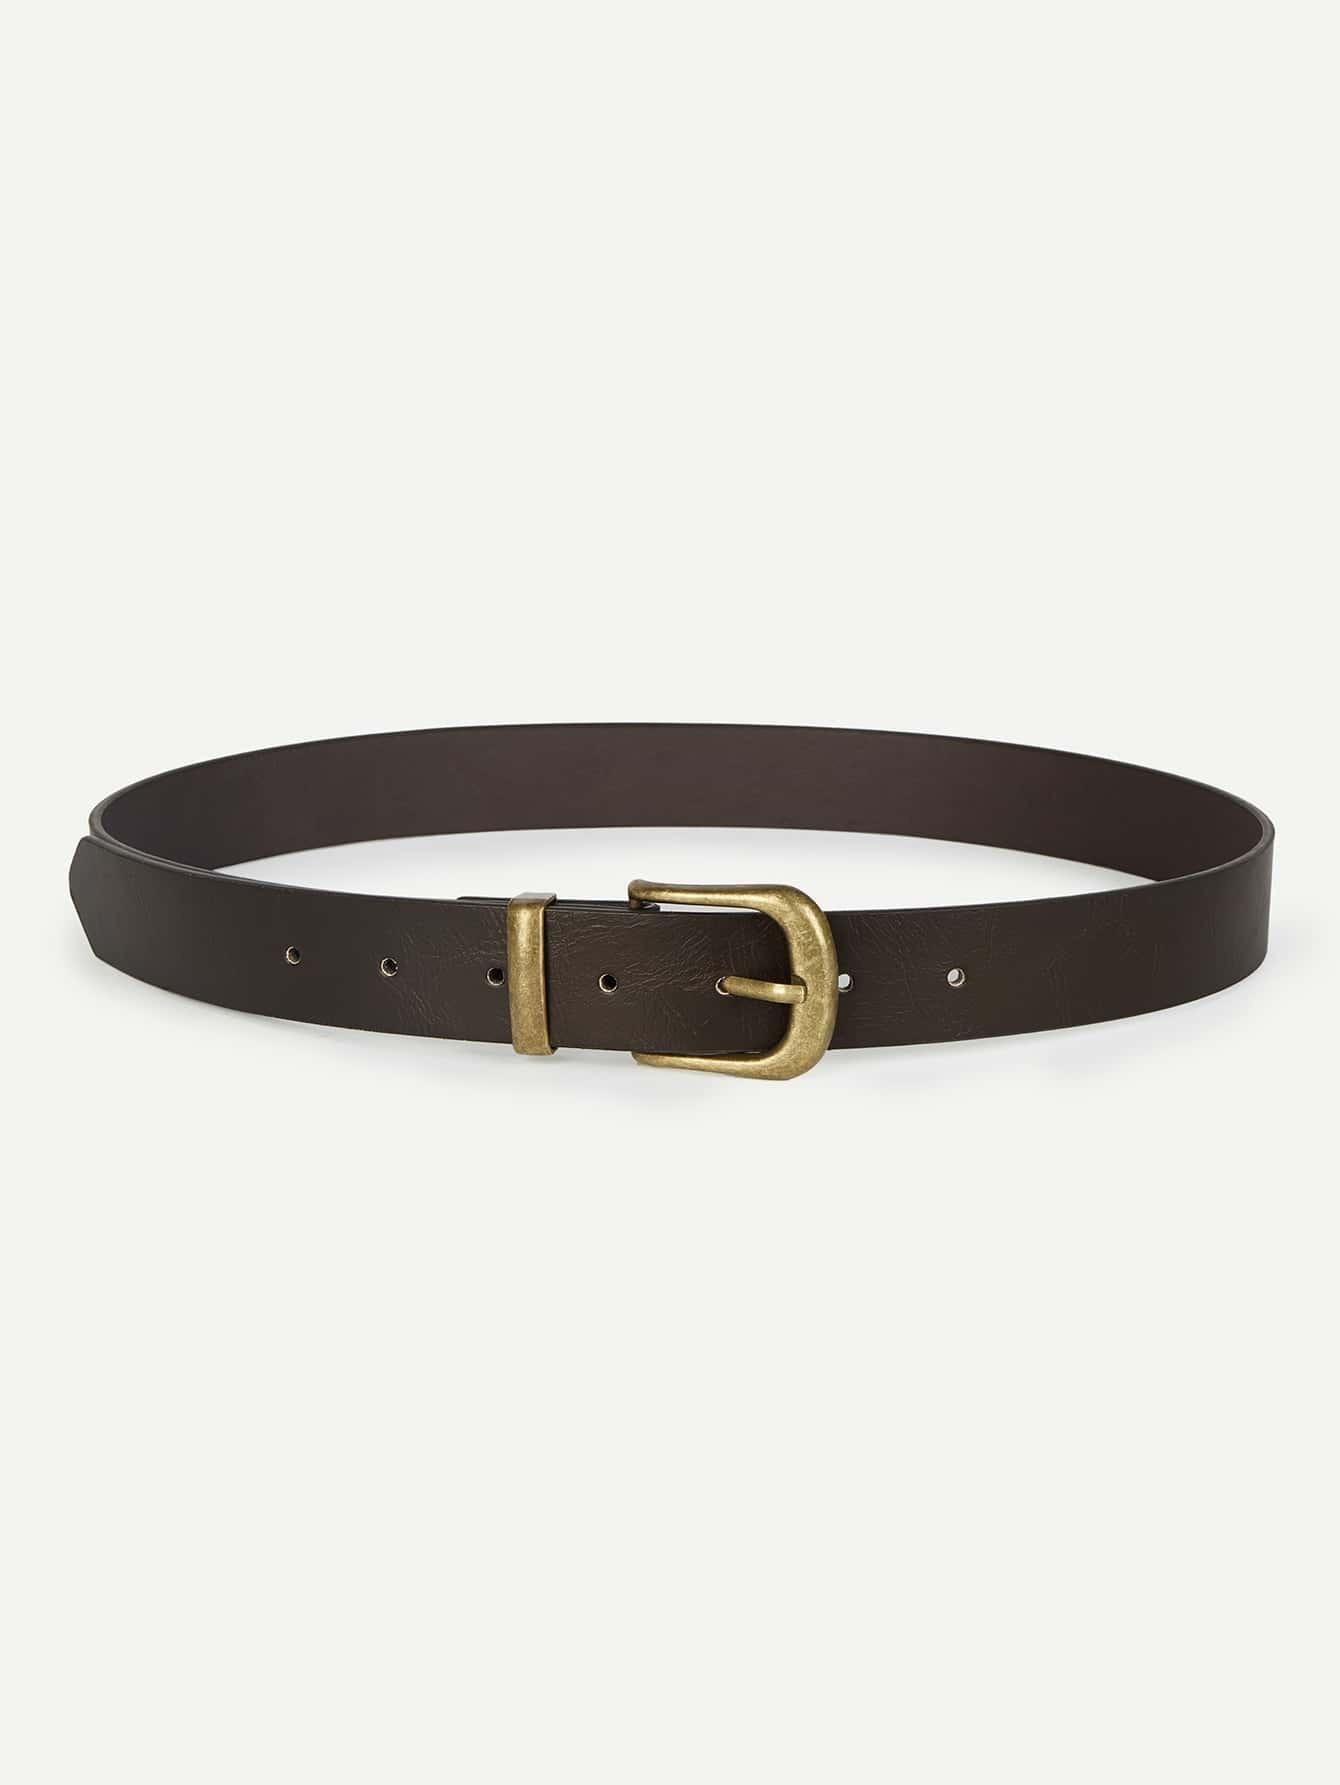 Metal Buckle PU Belt belt cp v2 metal